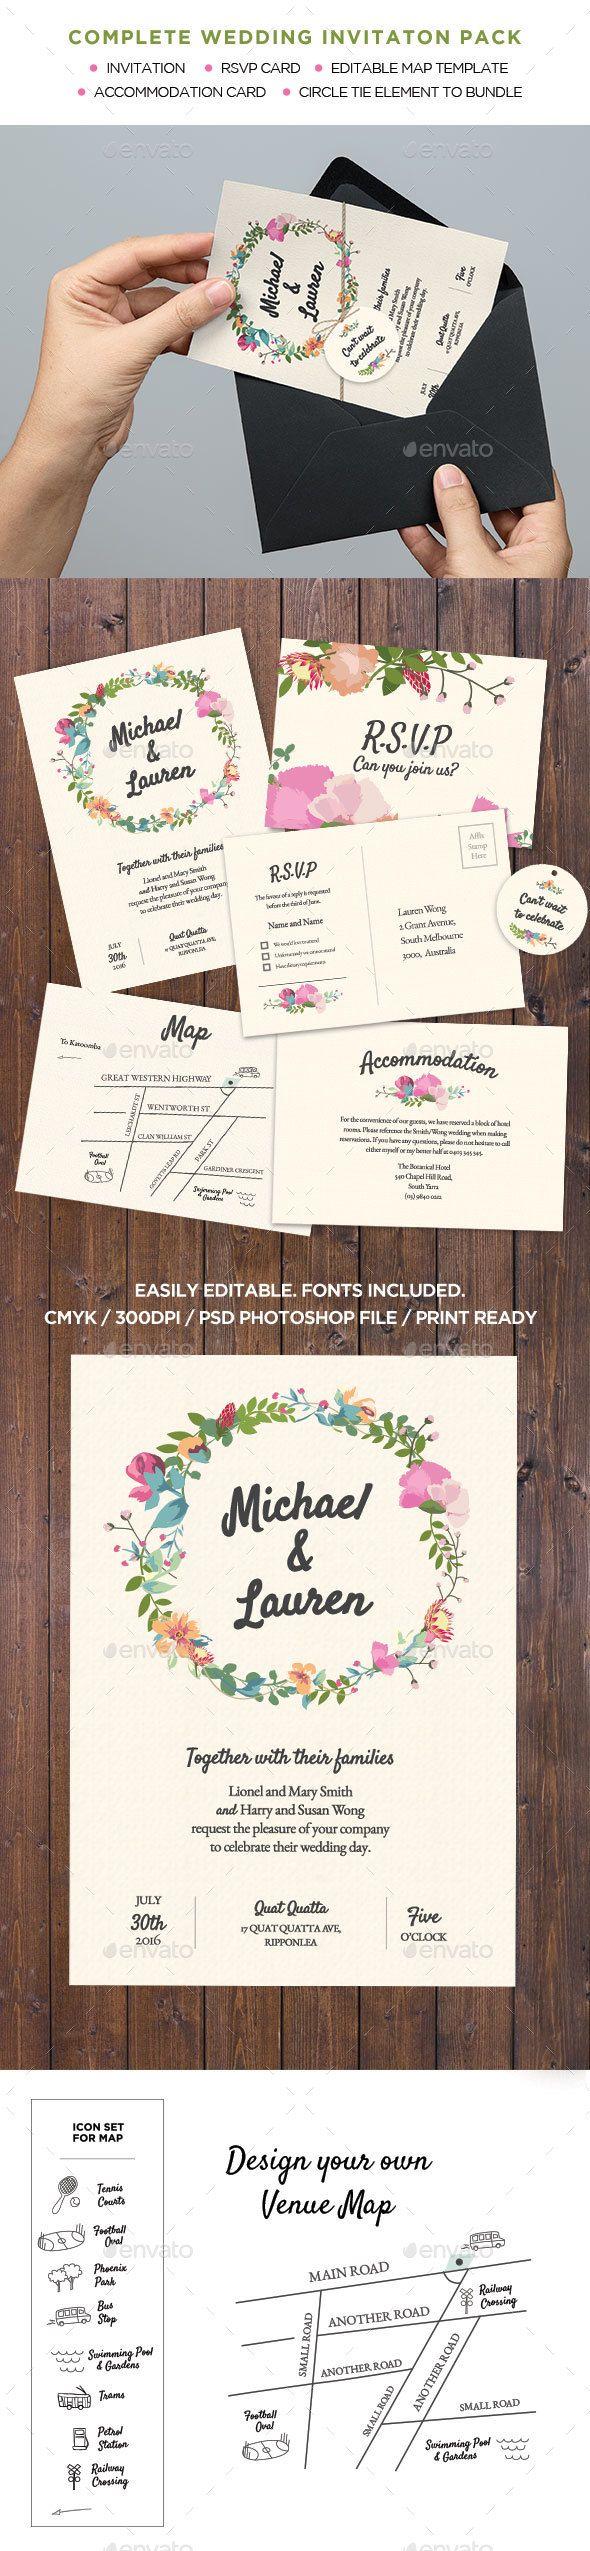 93 Best Wedding Invitations Images On Pinterest Wedding Stationary